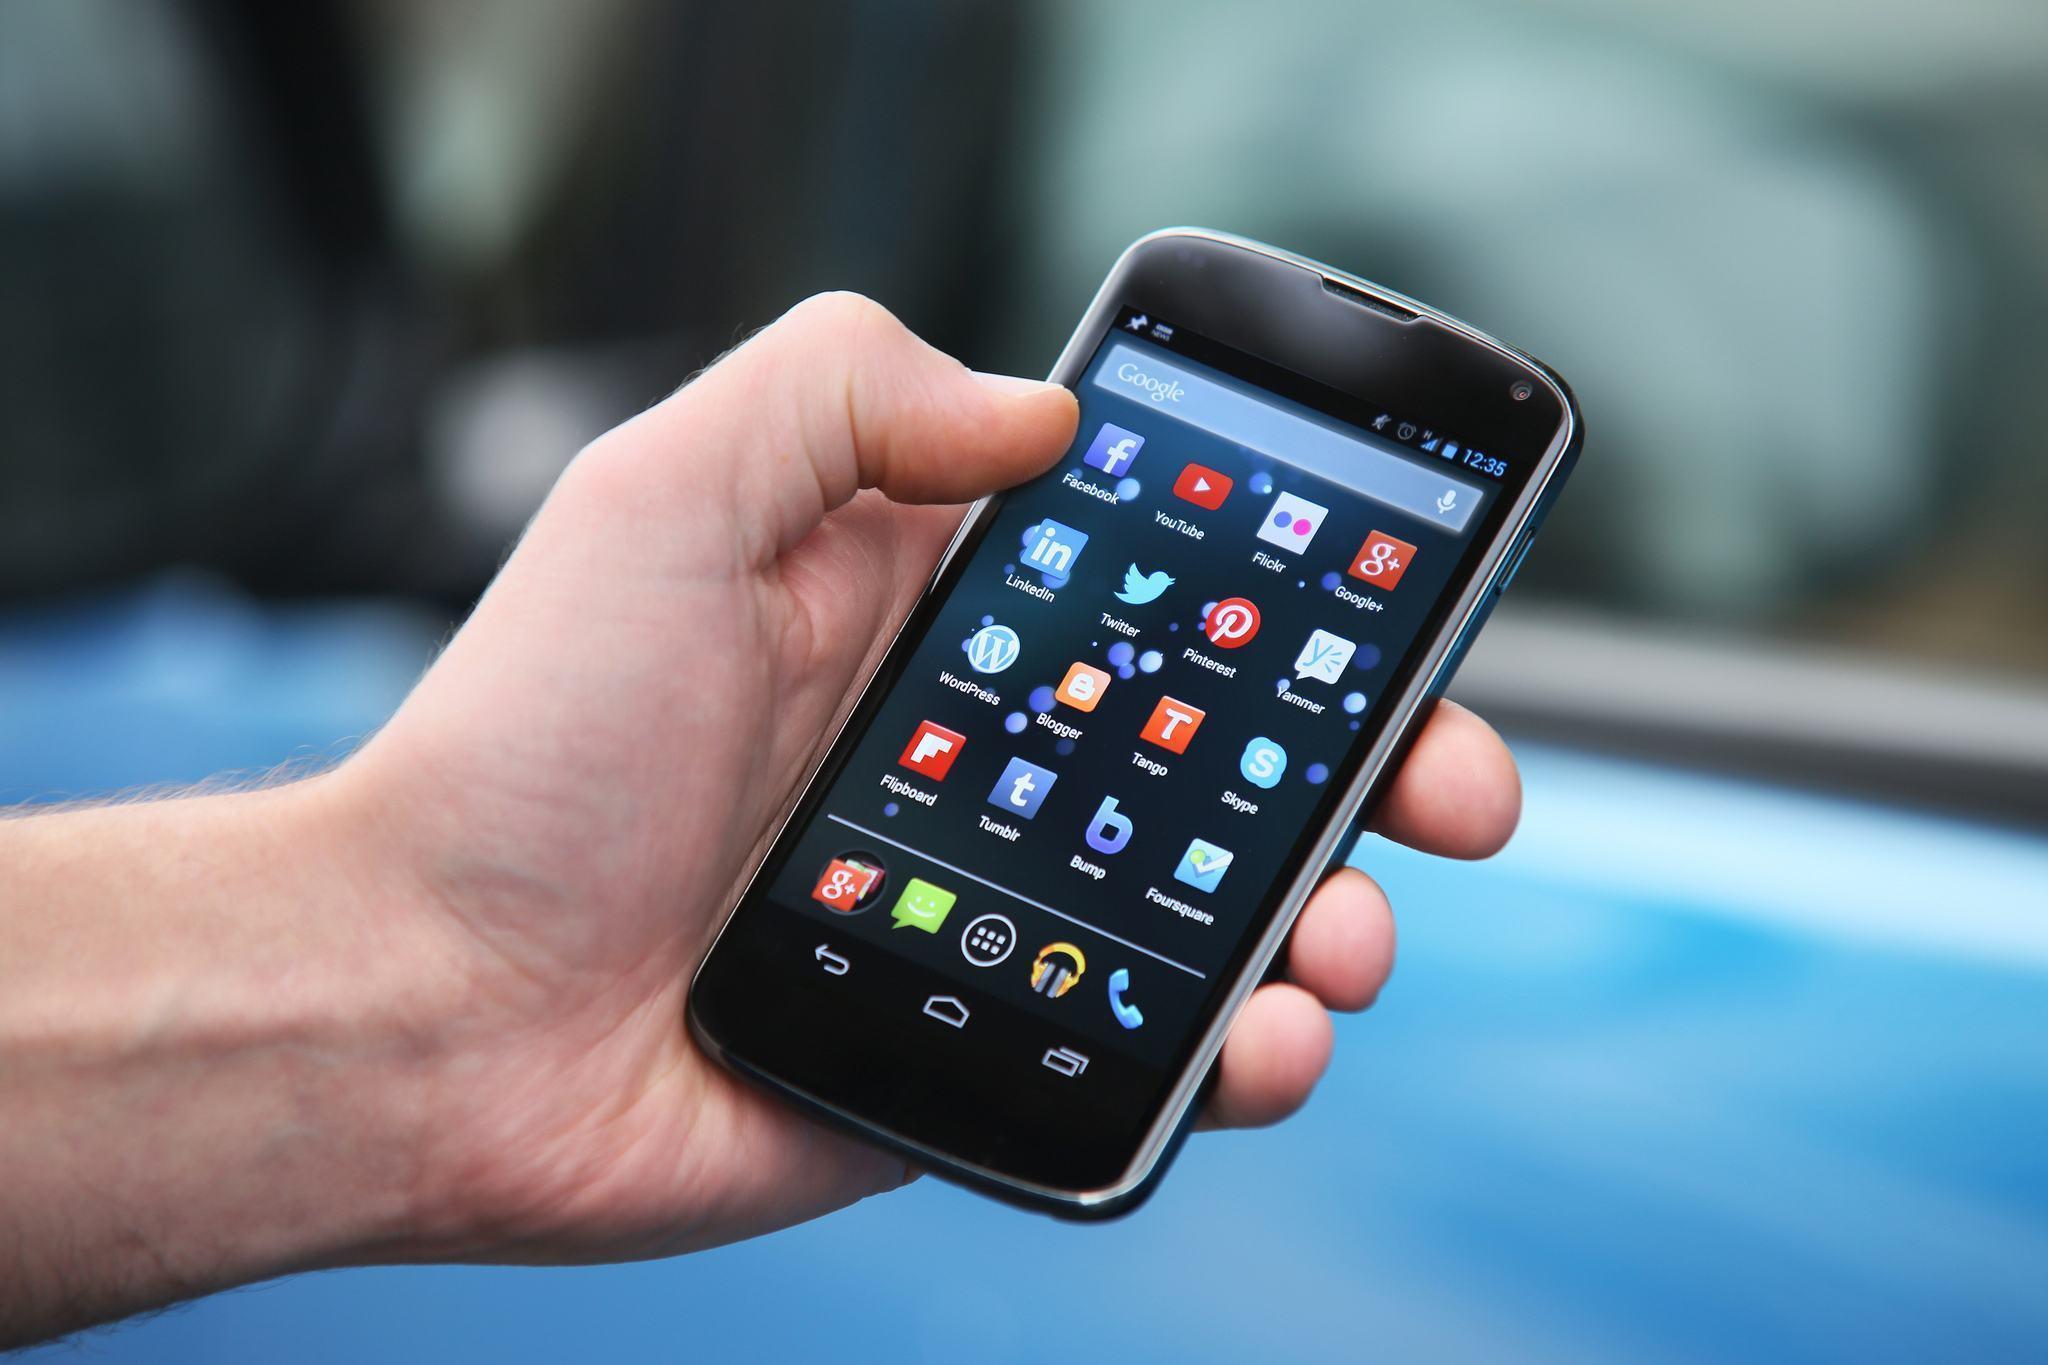 Nexus 4 com a gaveta de apps aberta.